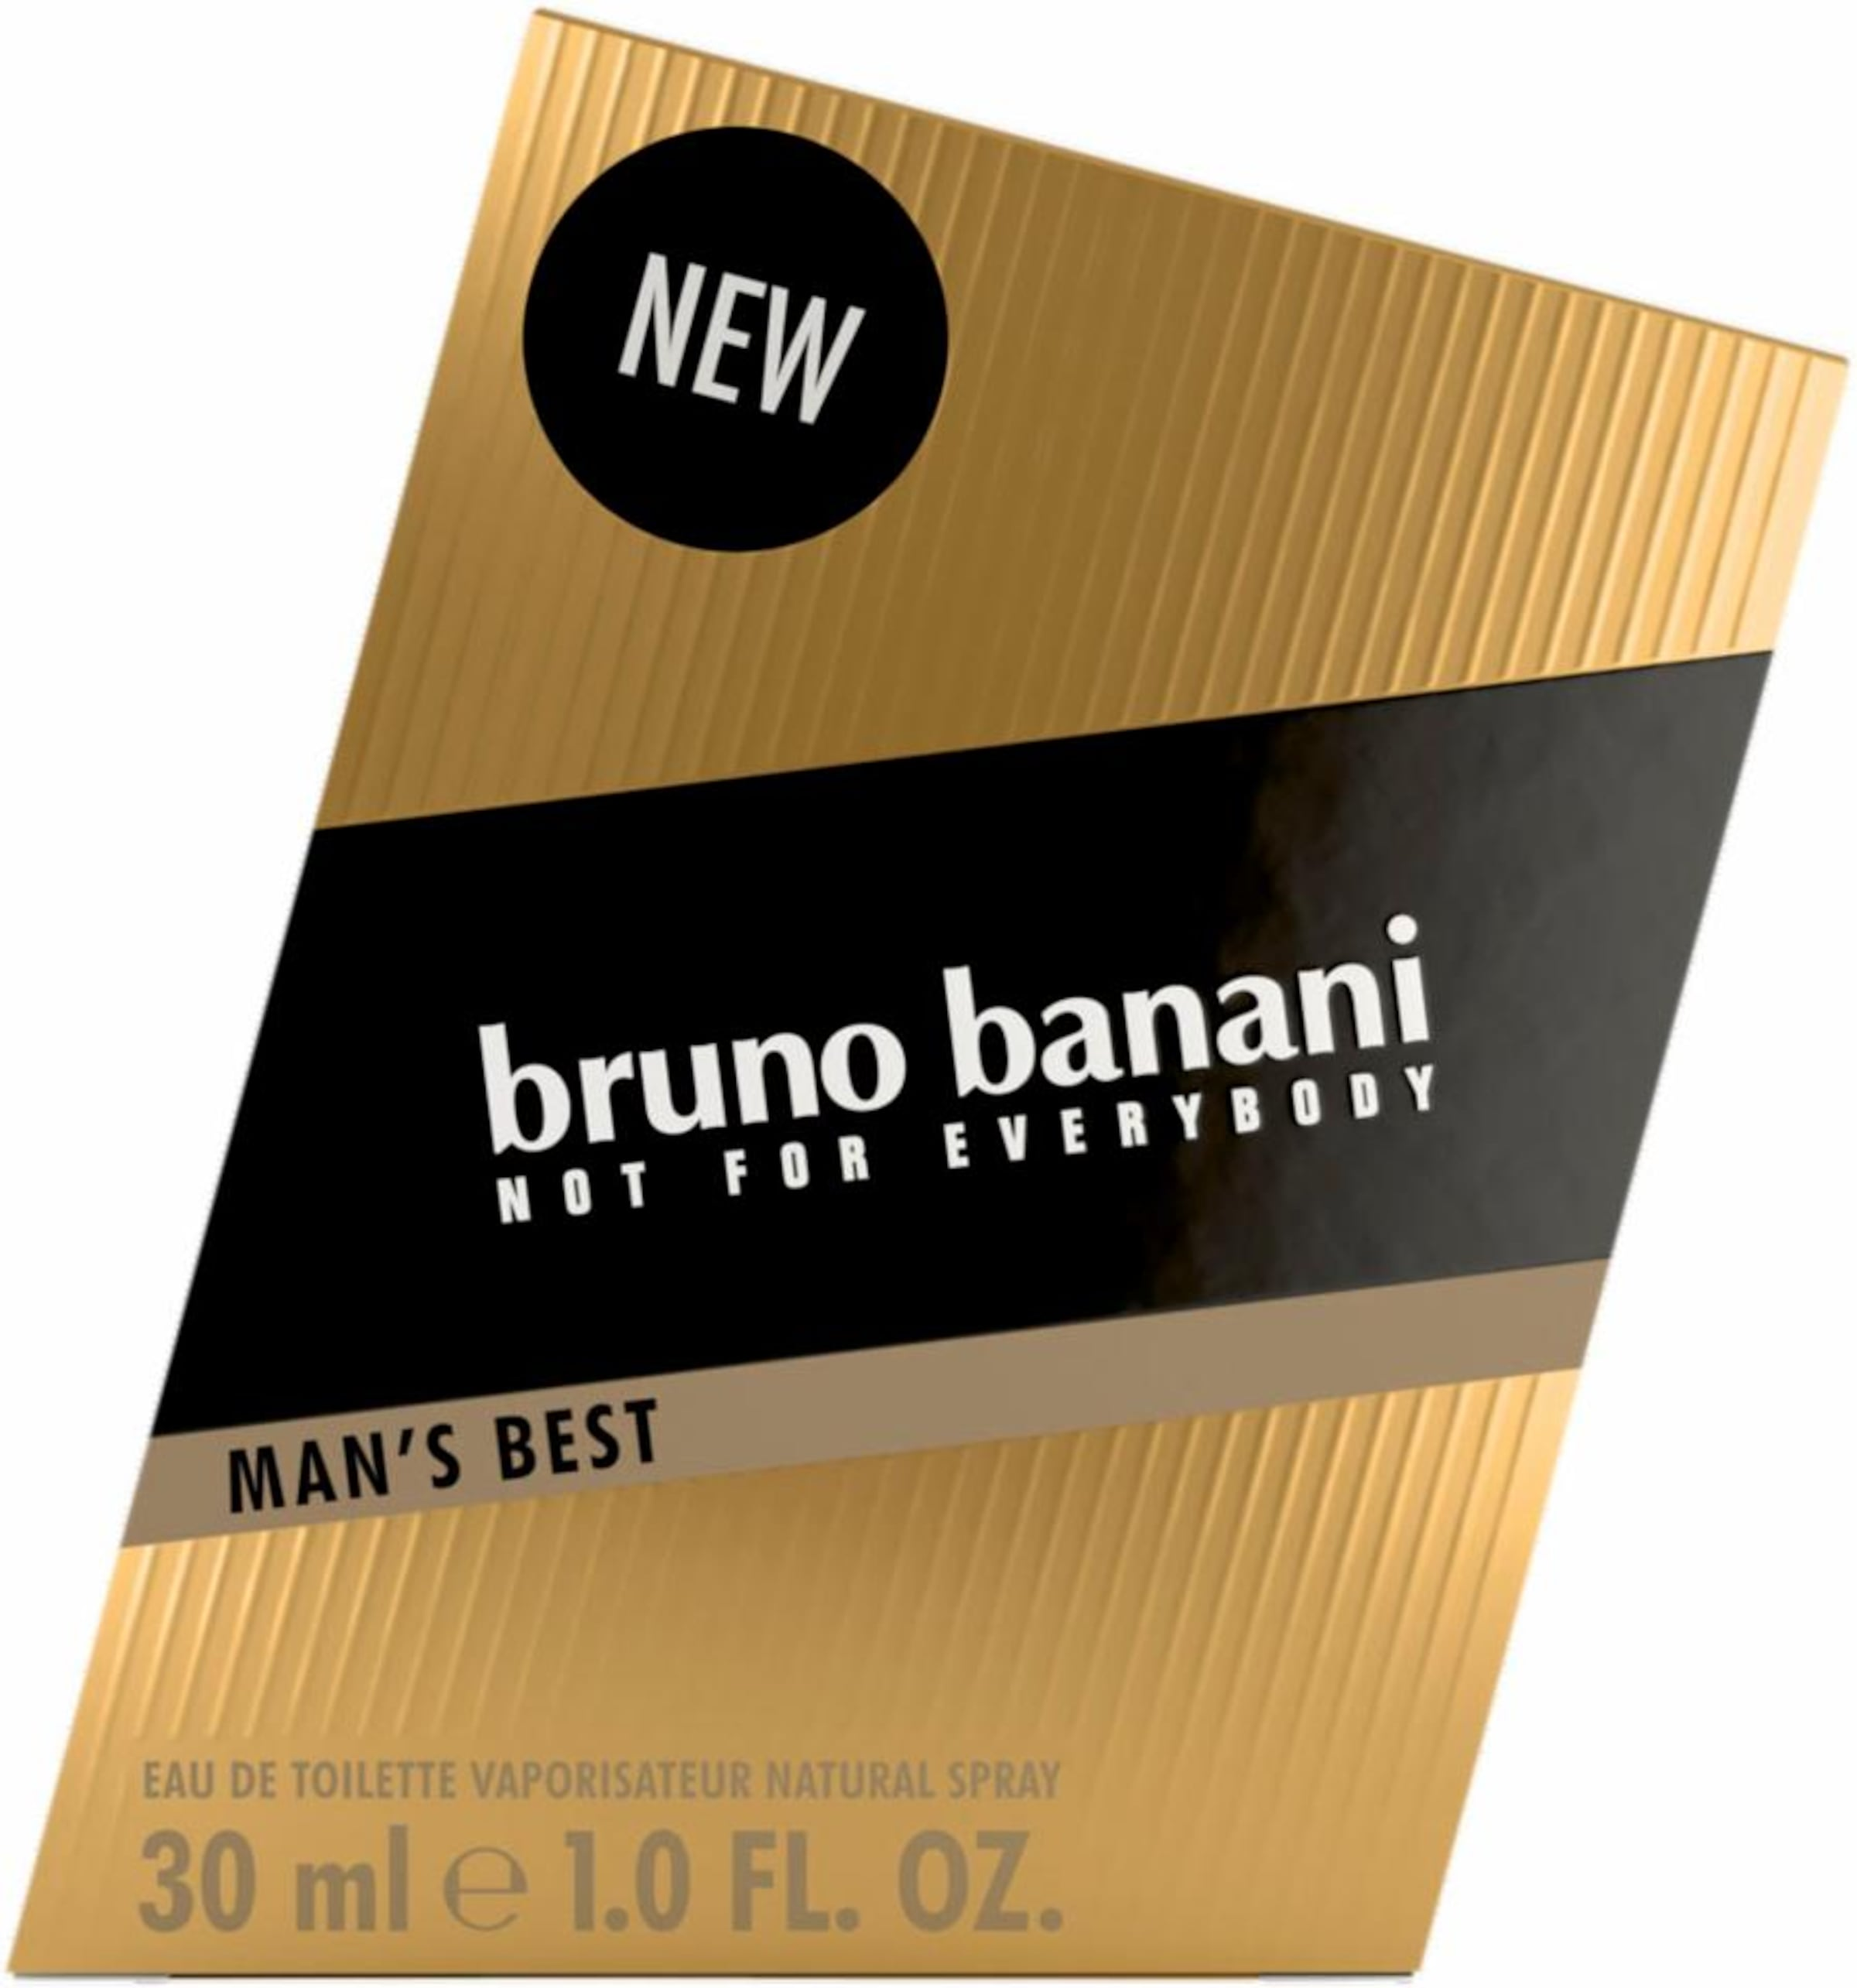 Toilette 'man's Best'Eau Bruno Banani De In Gold OkZiuPXT